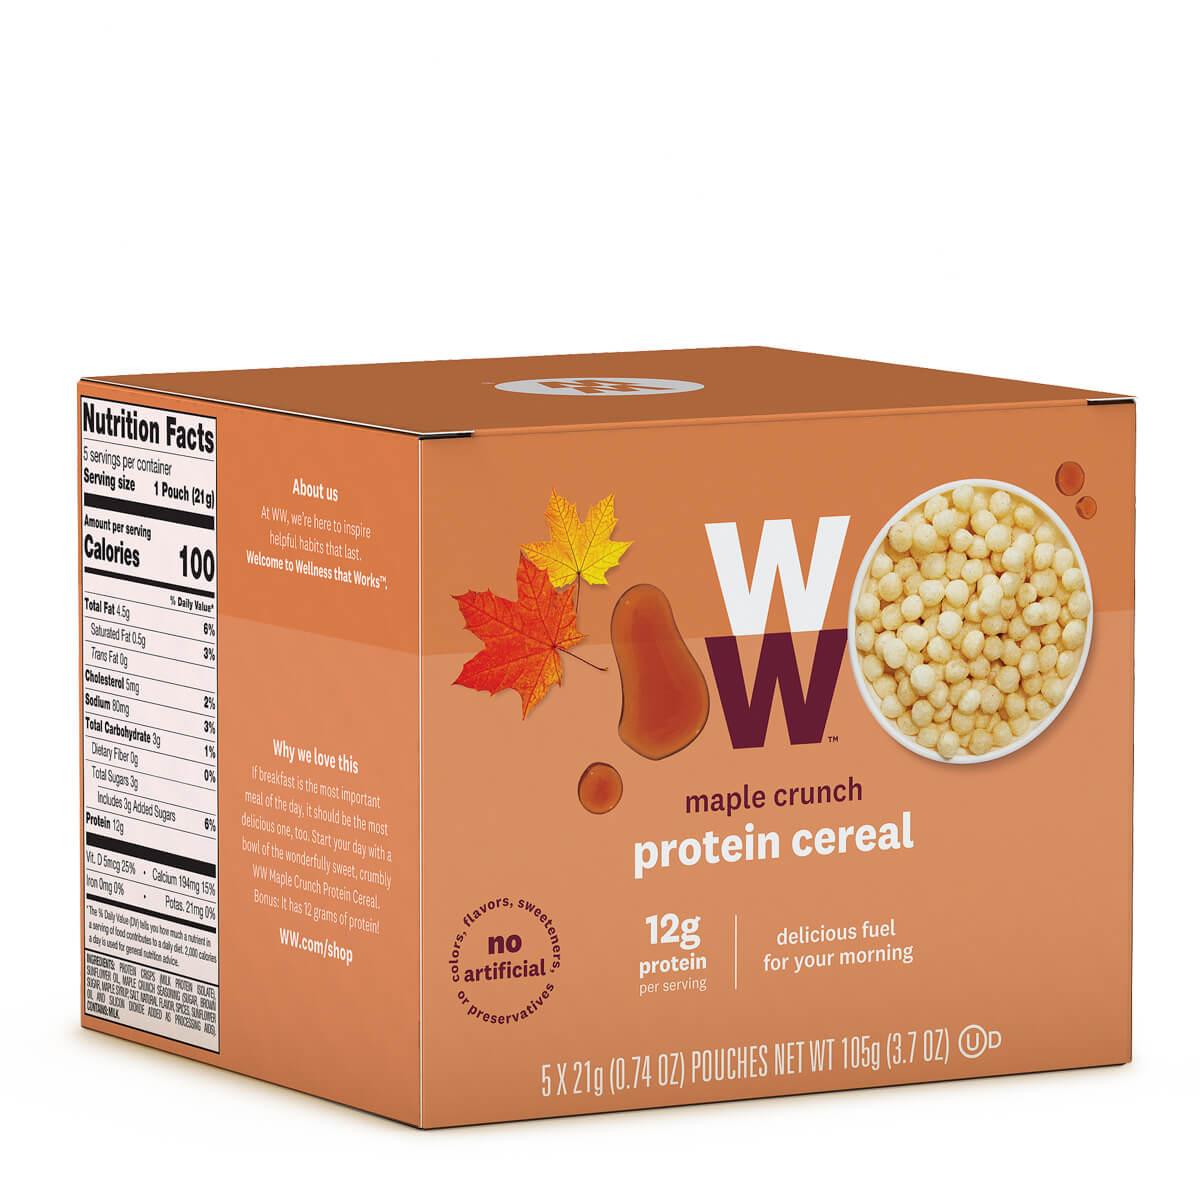 Maple Crunch Protein Cereal - corner